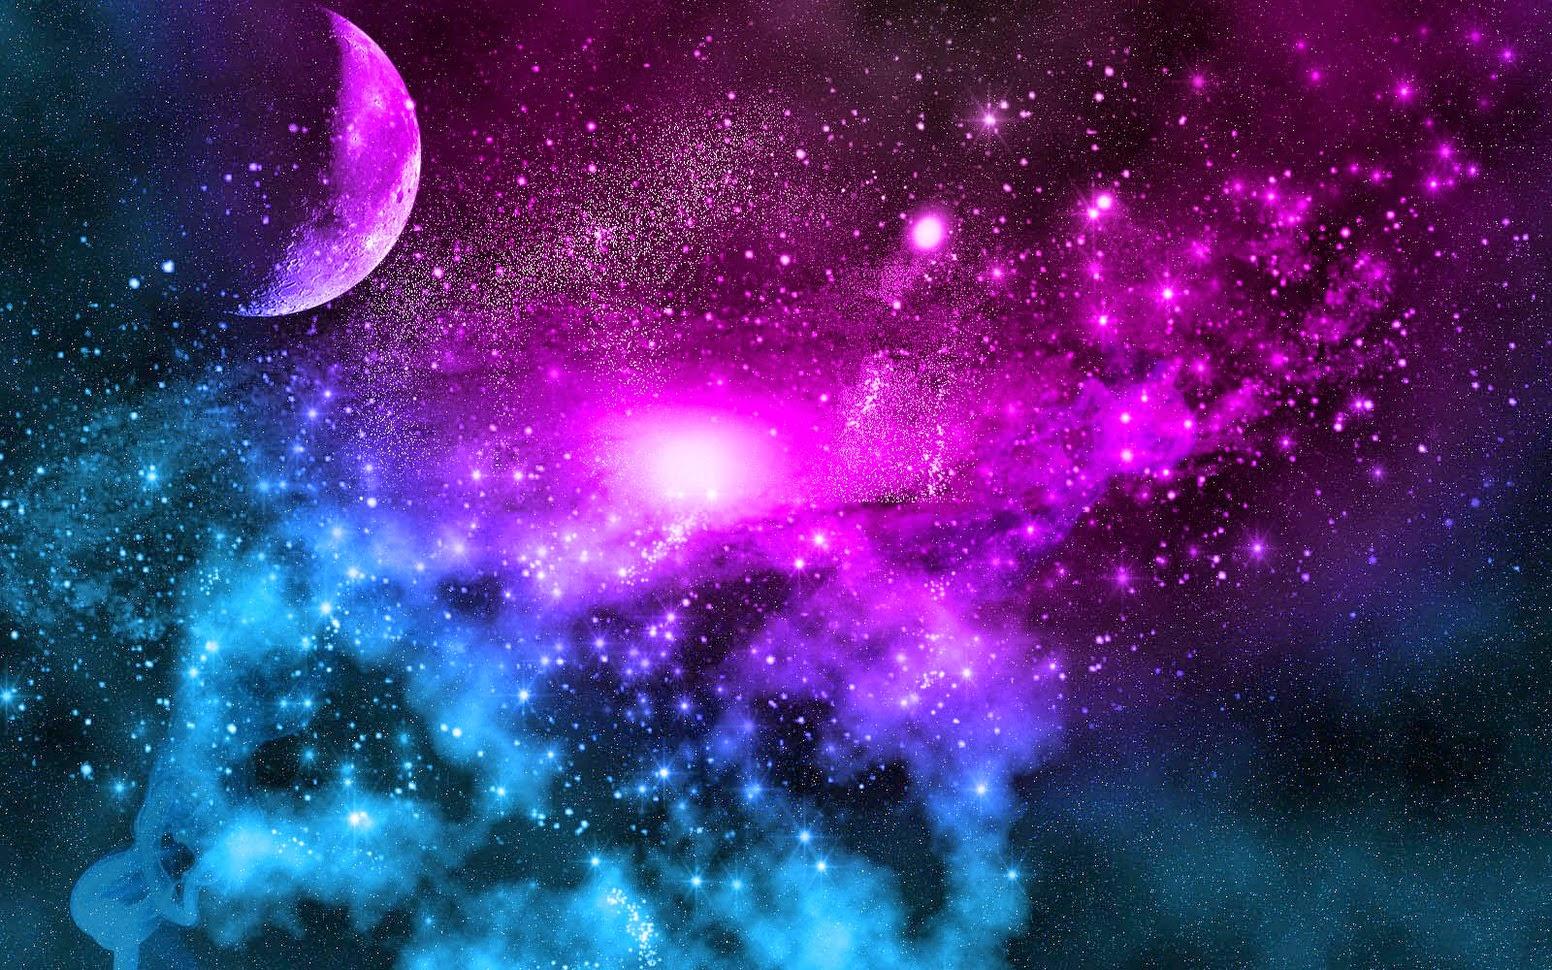 galaxy wallpaper free download 2015 02 08